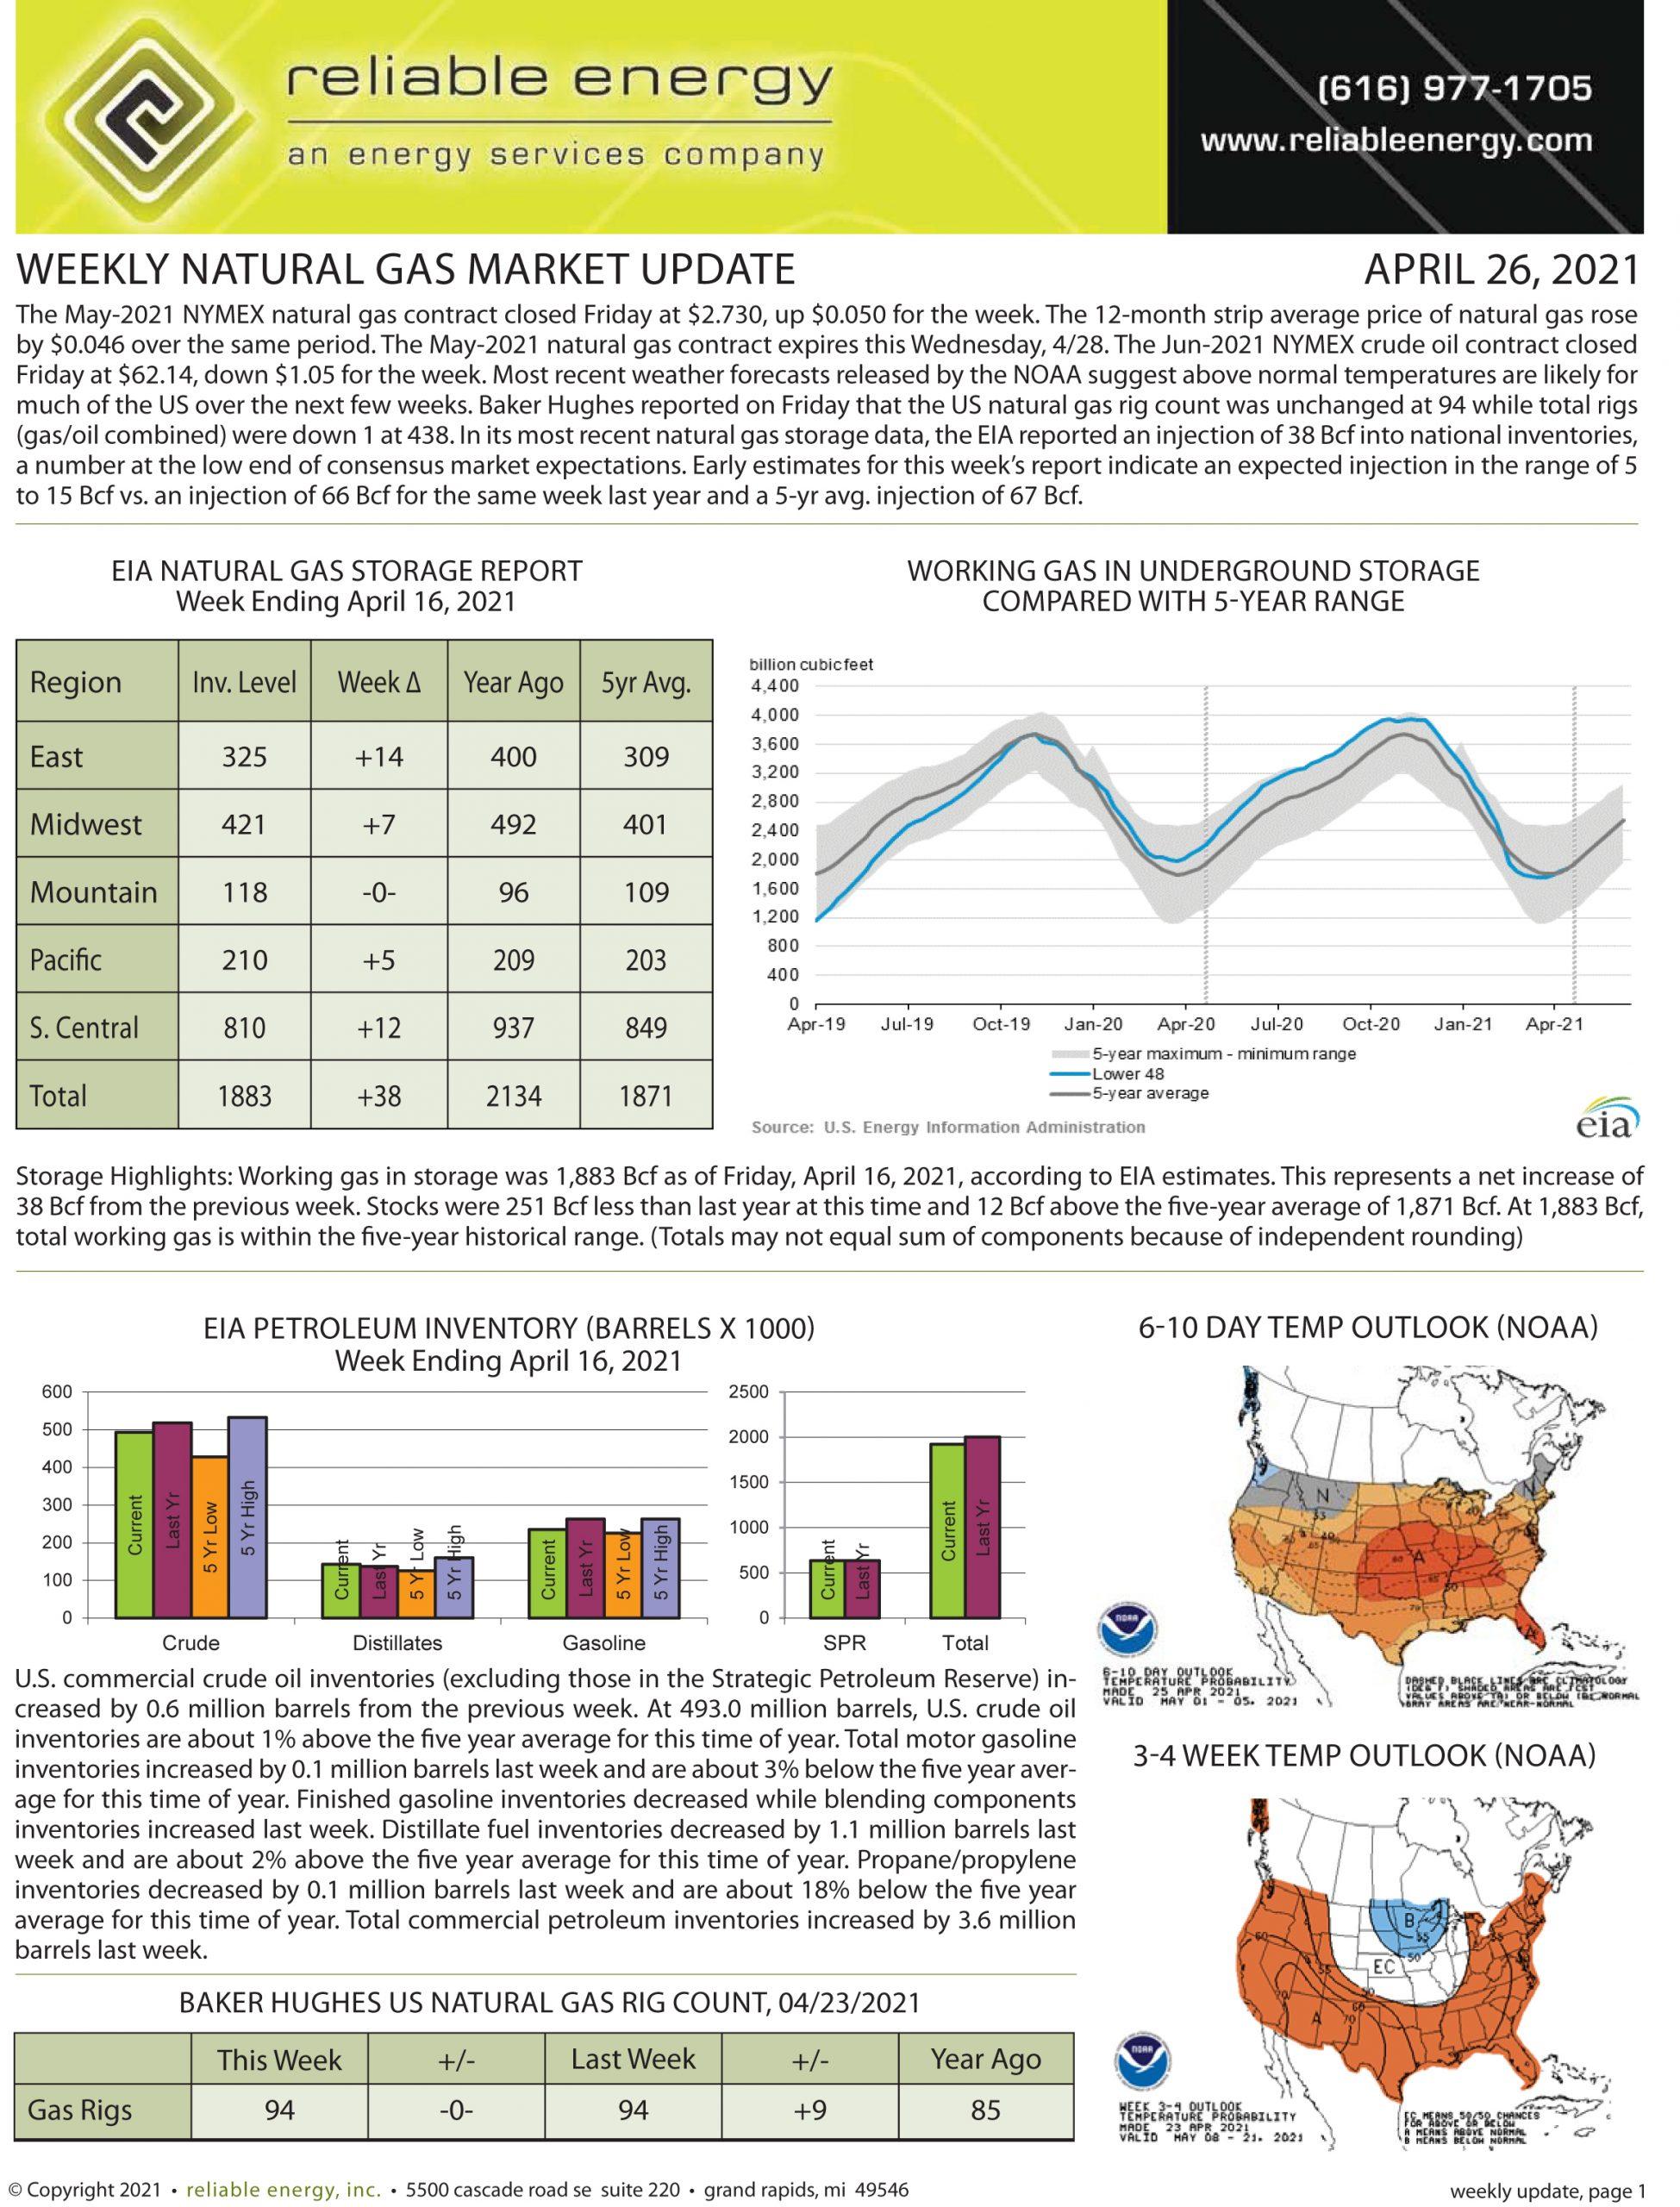 Natural Gas Market Update – April 26, 2021